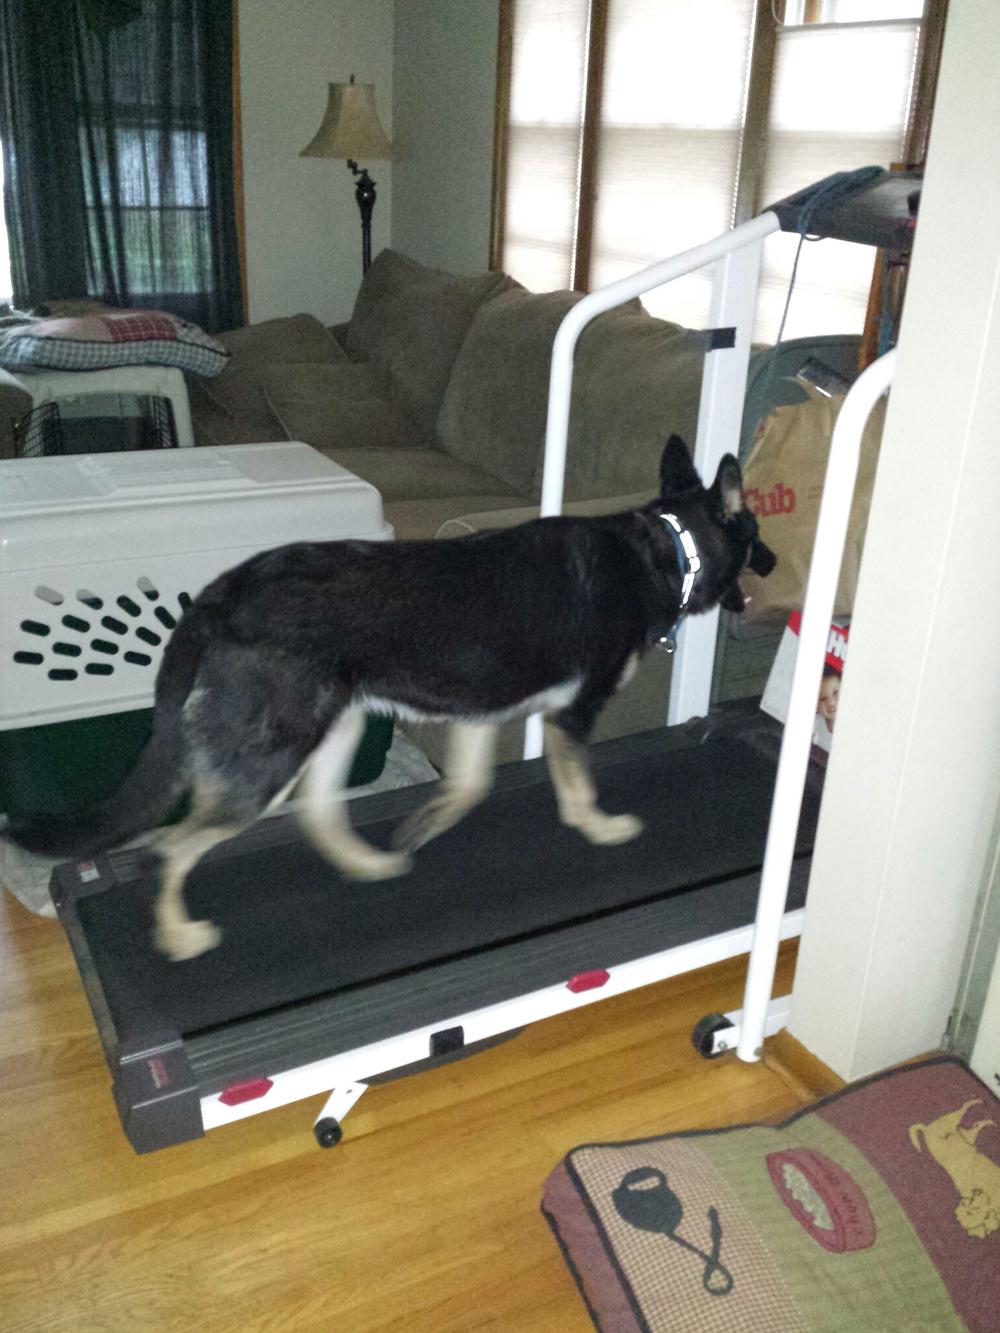 Dog training on tread mills